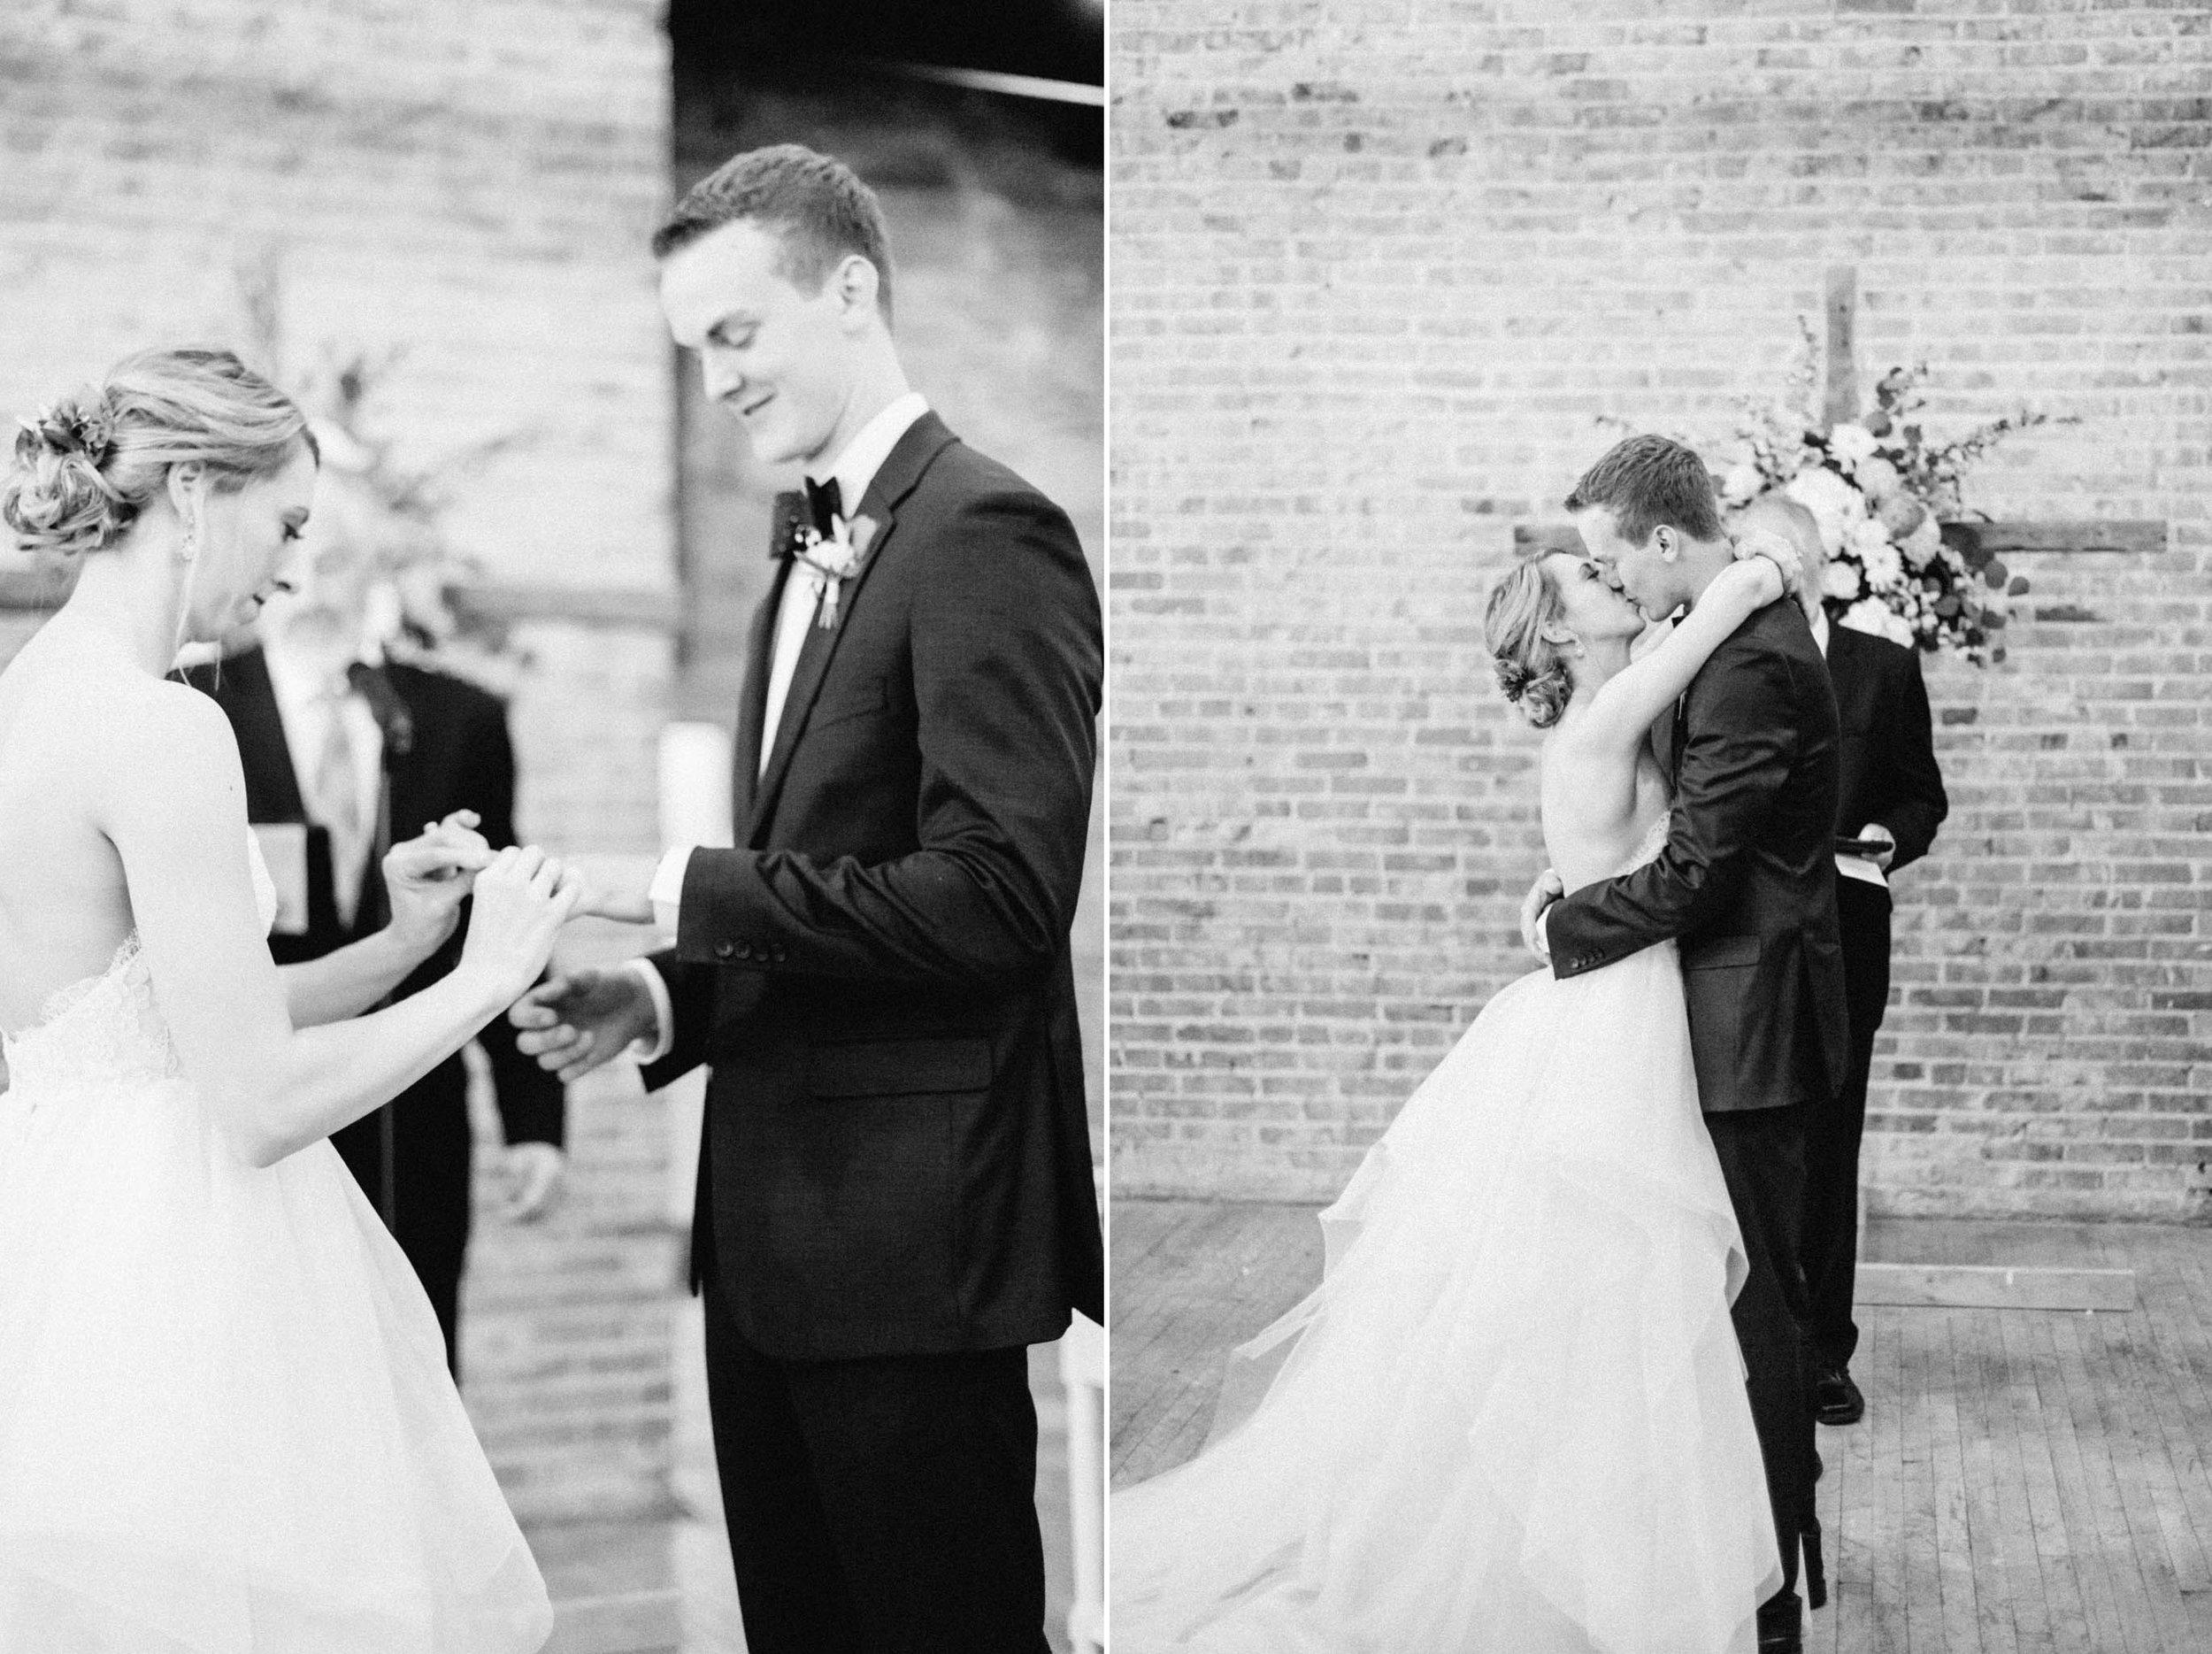 Sarah and Brad Wedding 2up-7.jpg